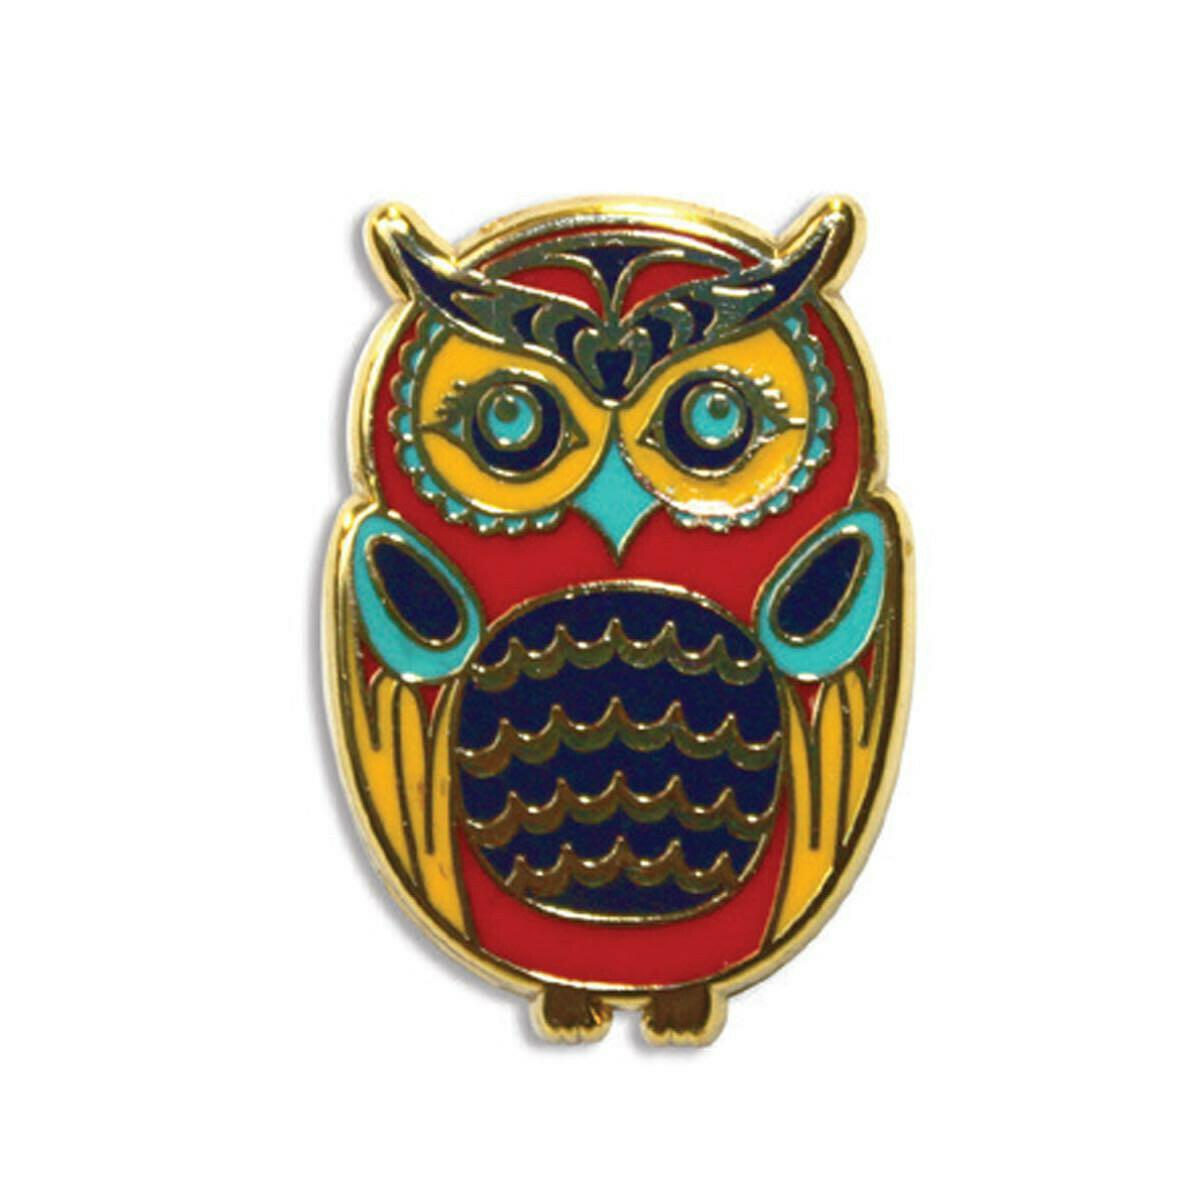 Enamel Pin - Owl